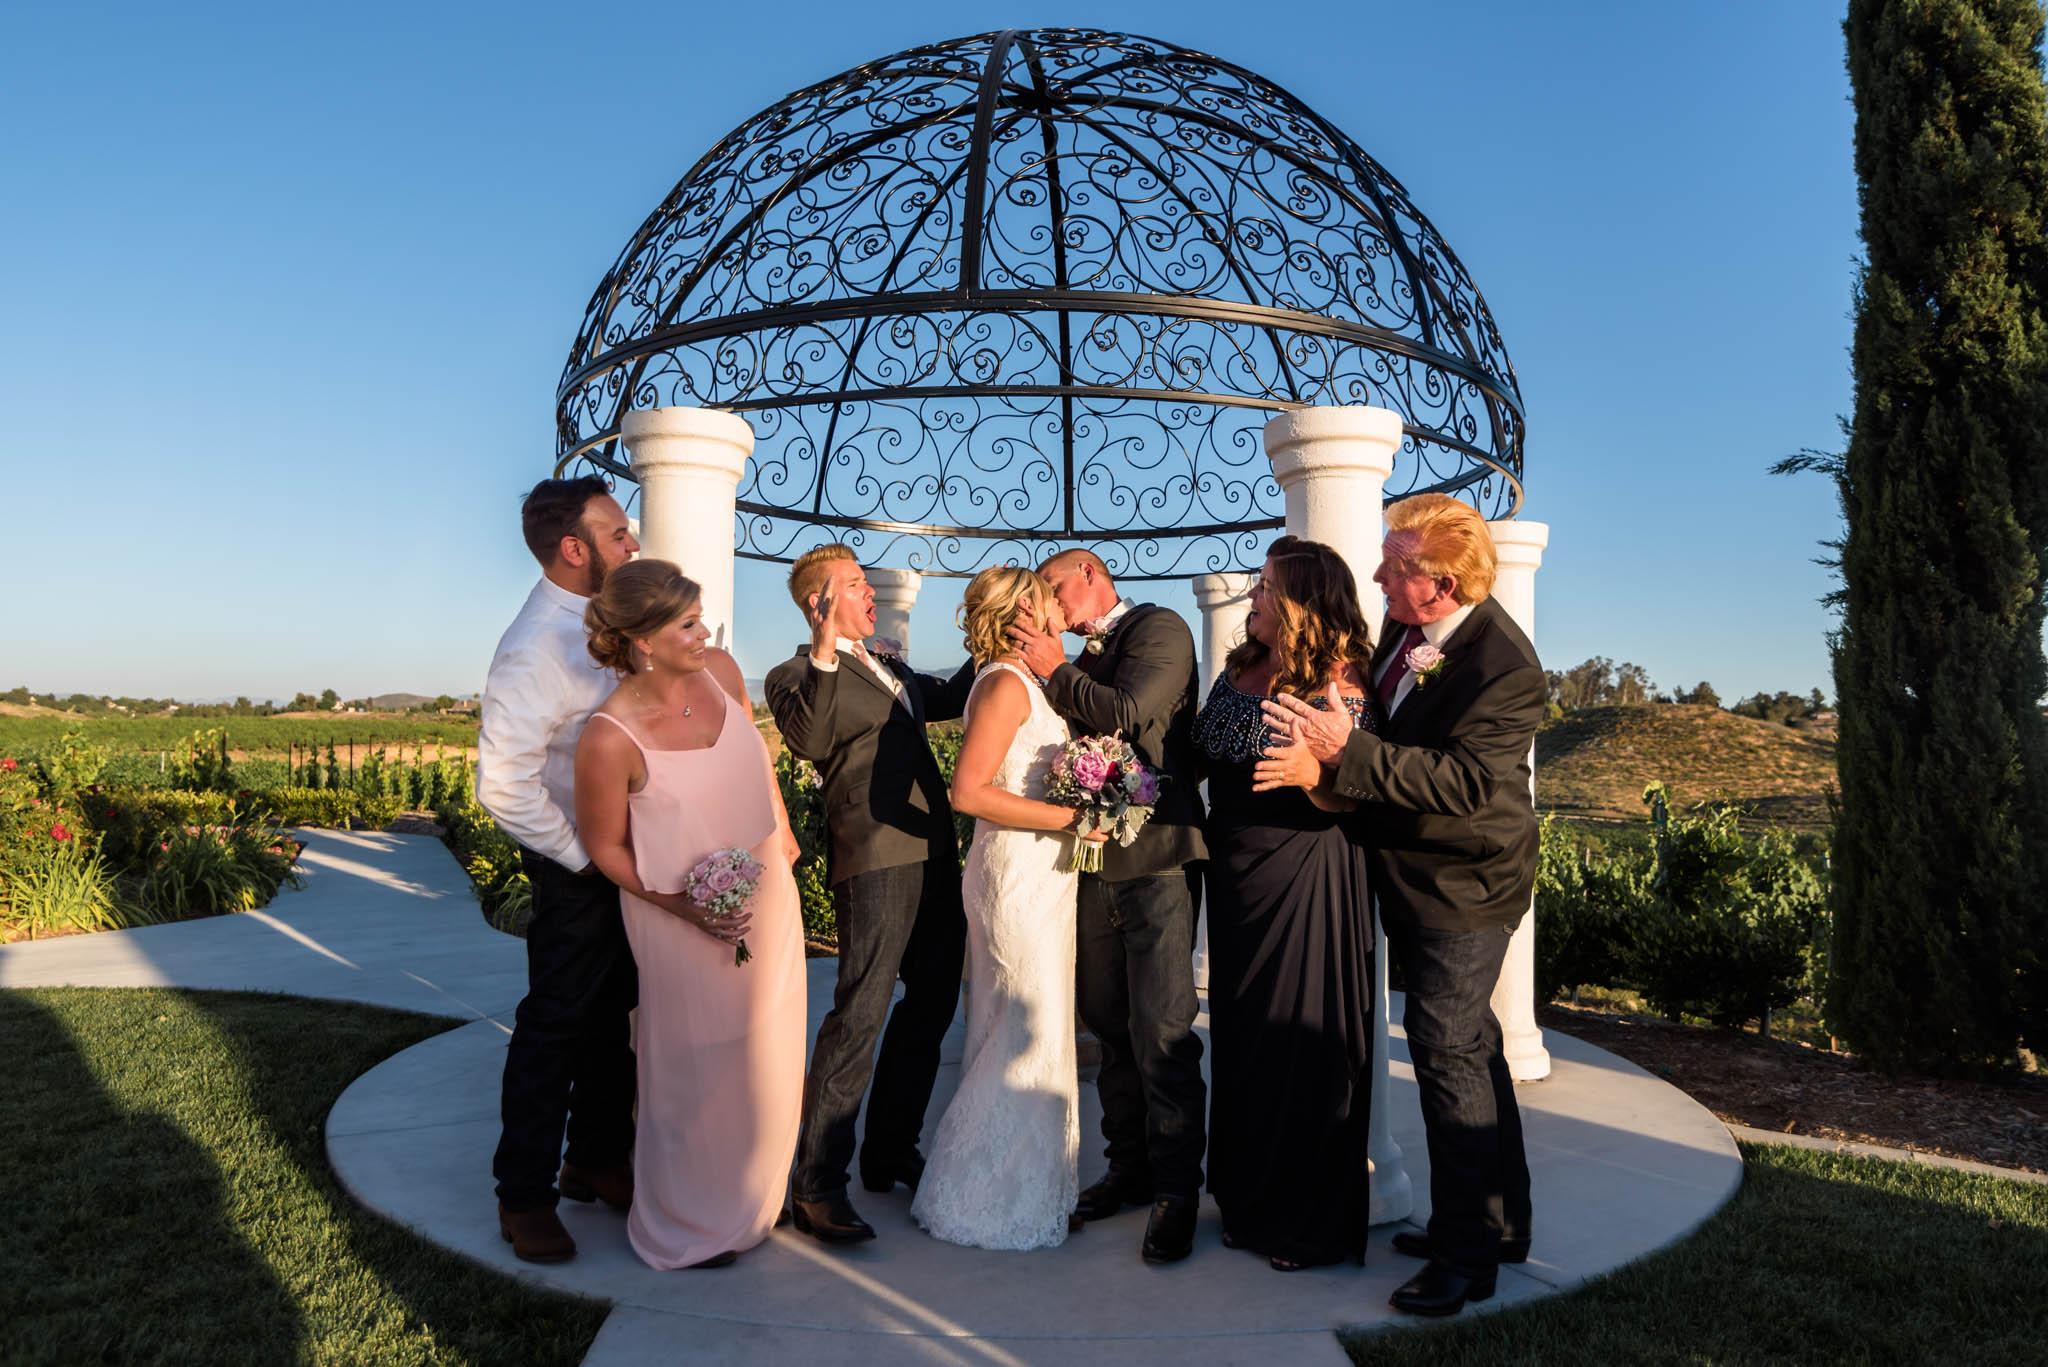 Avensole-Winery-Temecula-Wedding-Josh-and-Olivia-3711.JPG